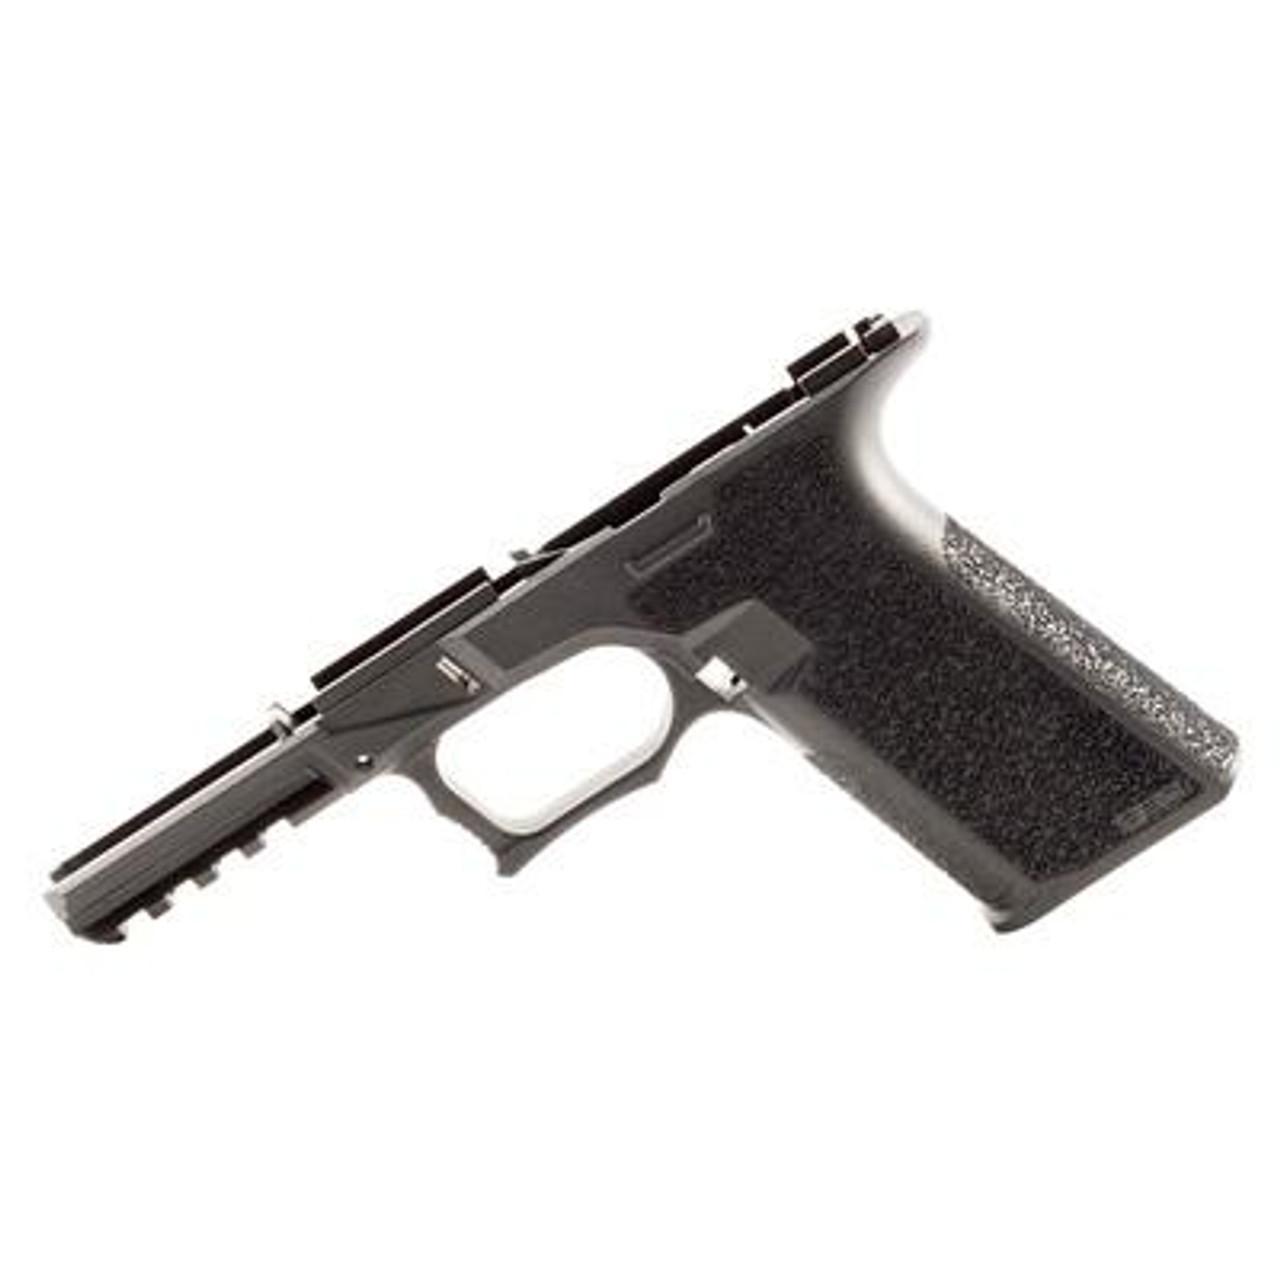 Polymer80 PF940v2 80% Pistol Frame Kit GLOCK®  17, 22, 31, 34, 35 Compatible